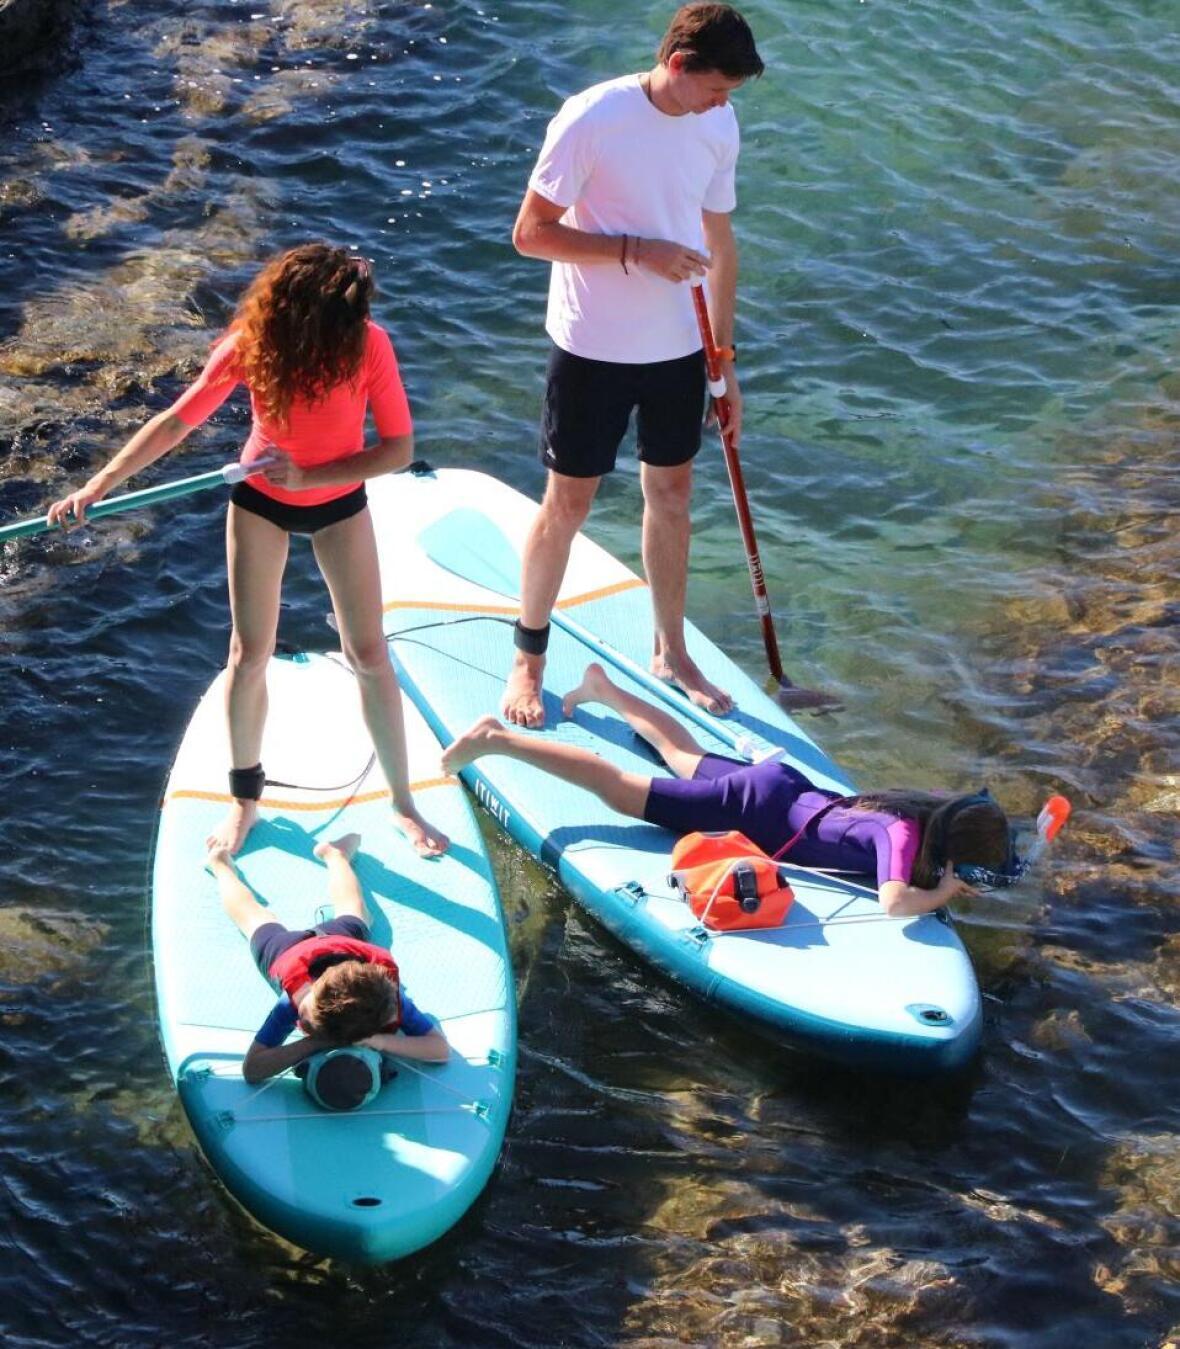 enfant stand up paddle balade